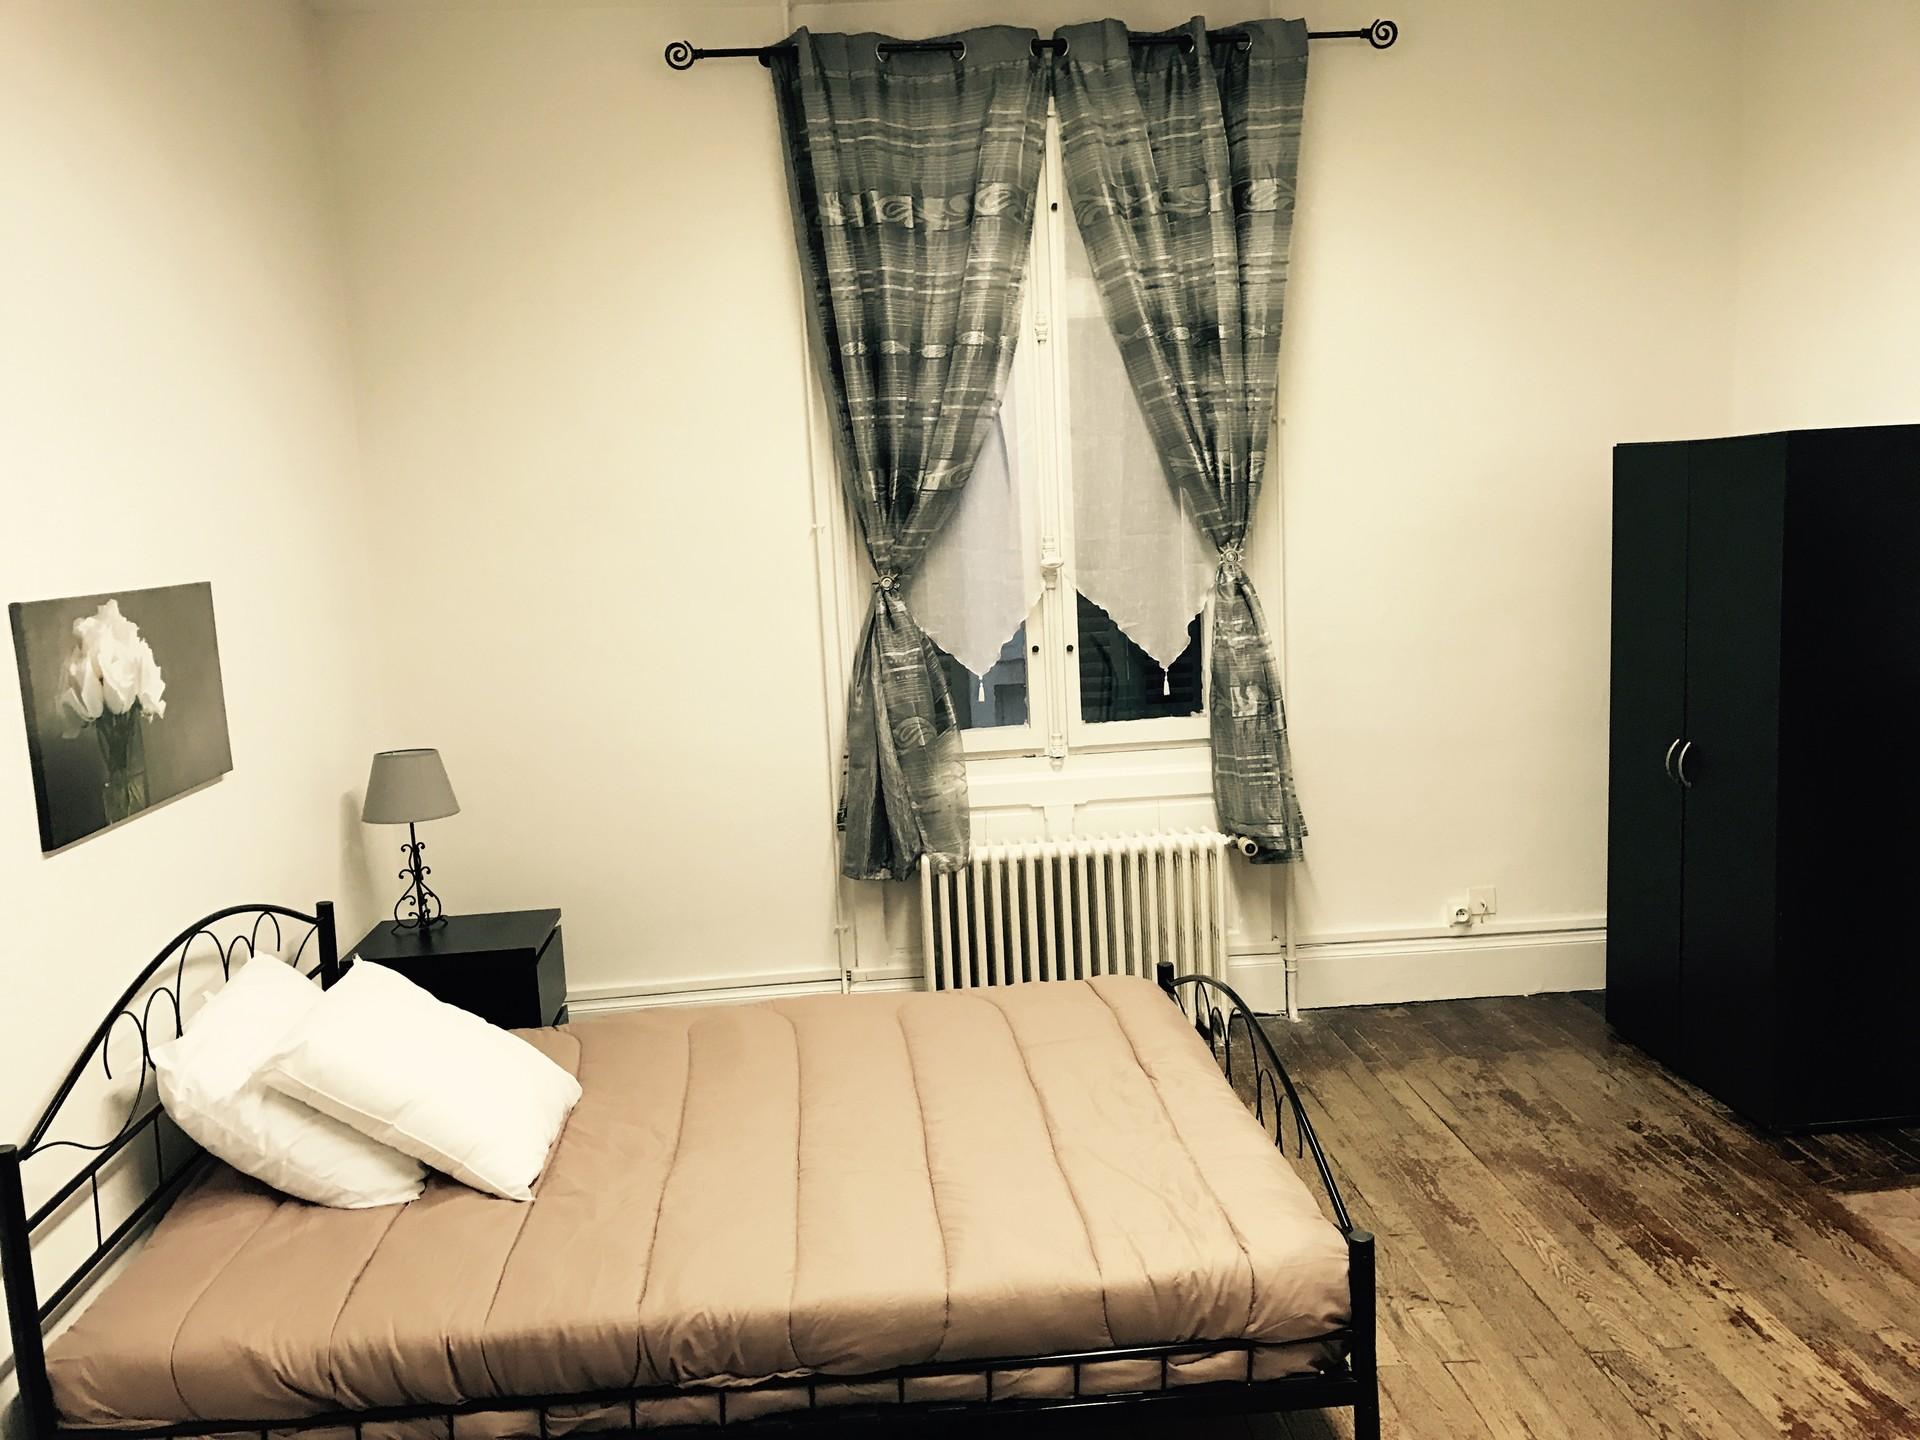 Colocation meubl e centre ville poitiers location chambres poitiers - Location chambre poitiers ...